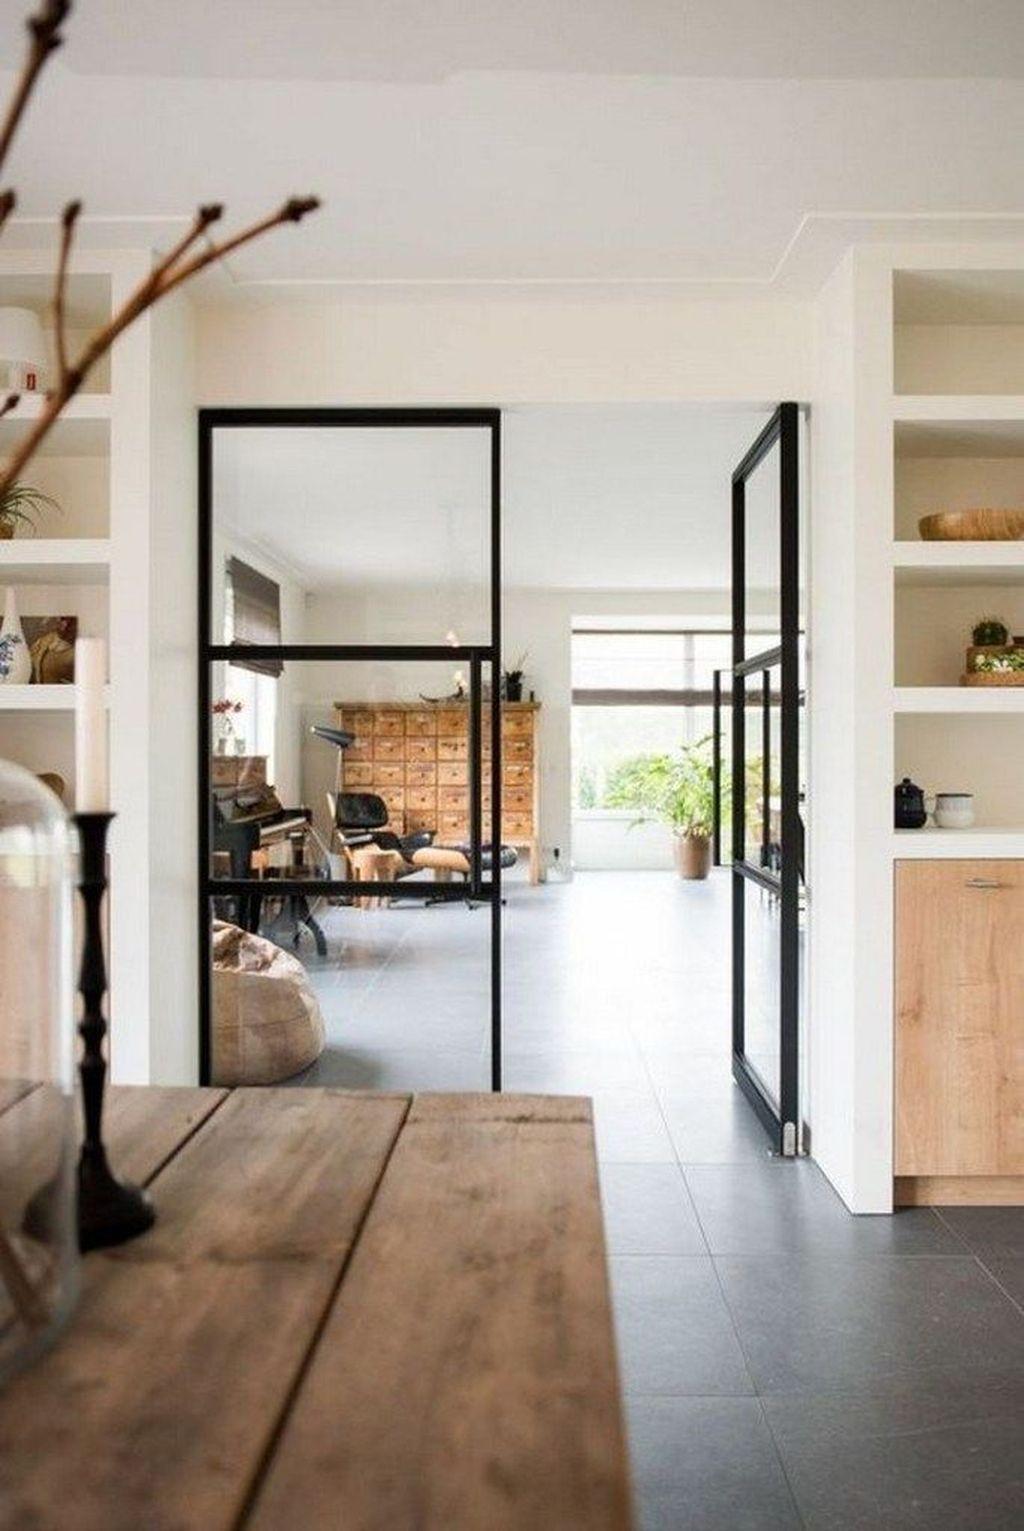 Minimalist Home Door Design You Have Must See32